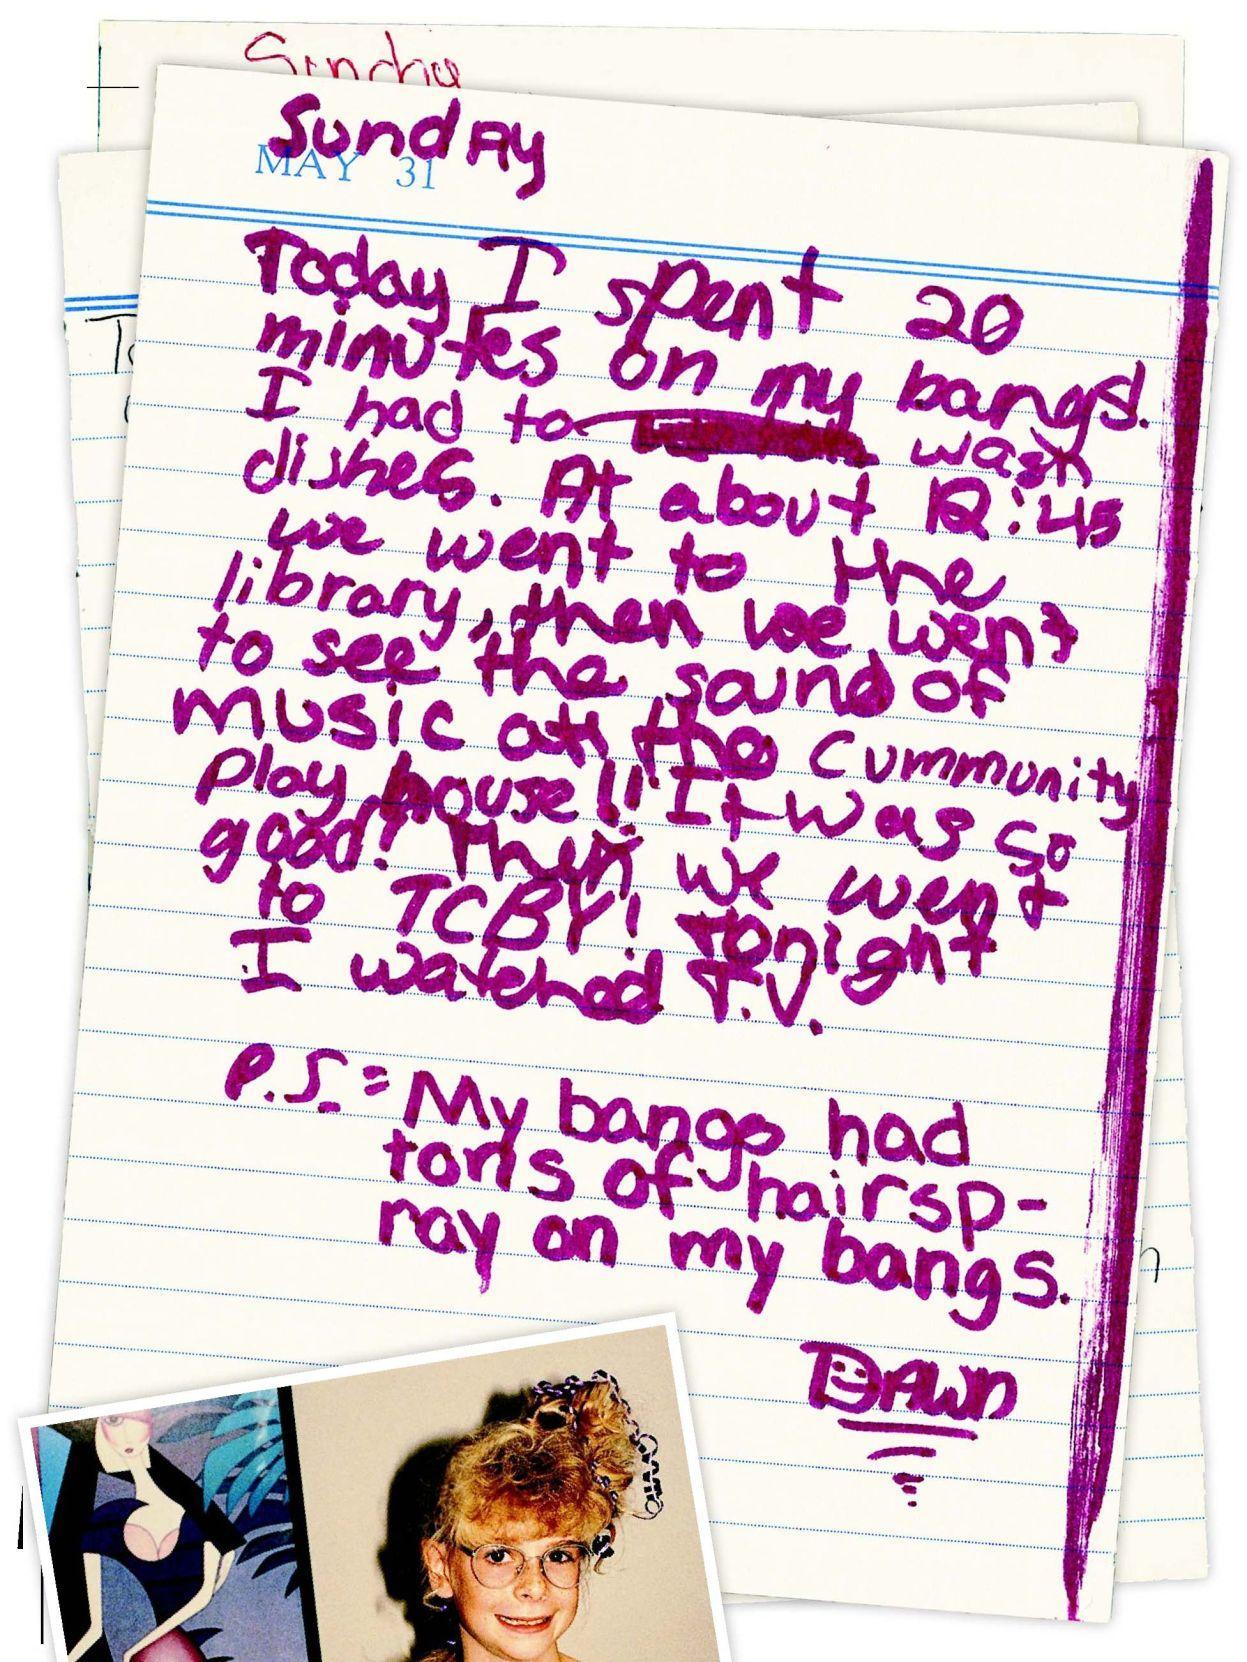 Not-so-secret diary of a '90s tween girl